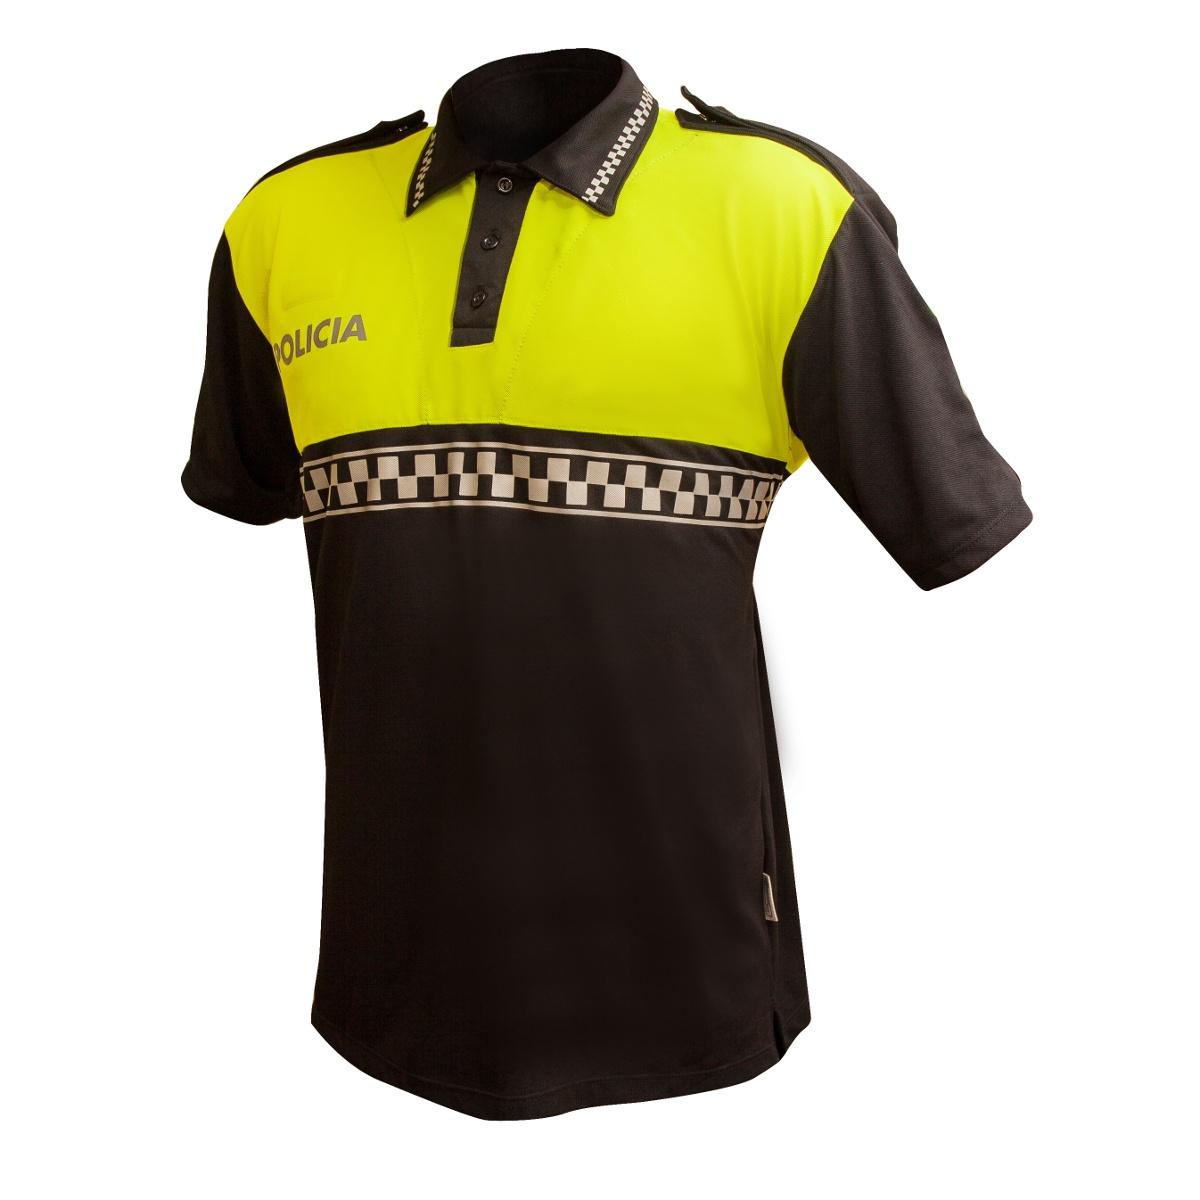 Camiseta Policía